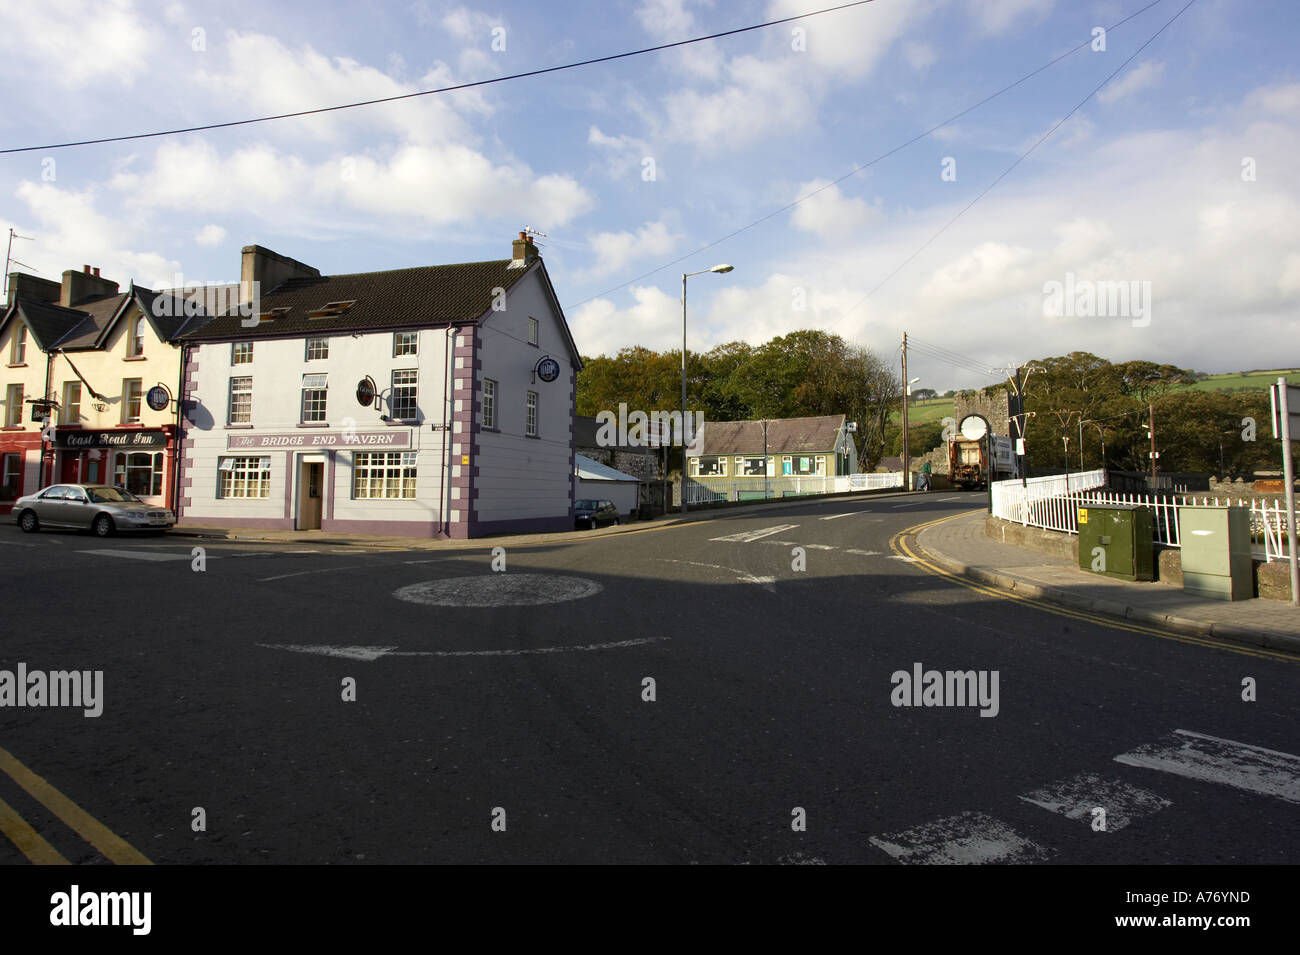 Roundabout on the main A2 coast road Glenarm Village county Antrim Northern Ireland Stock Photo